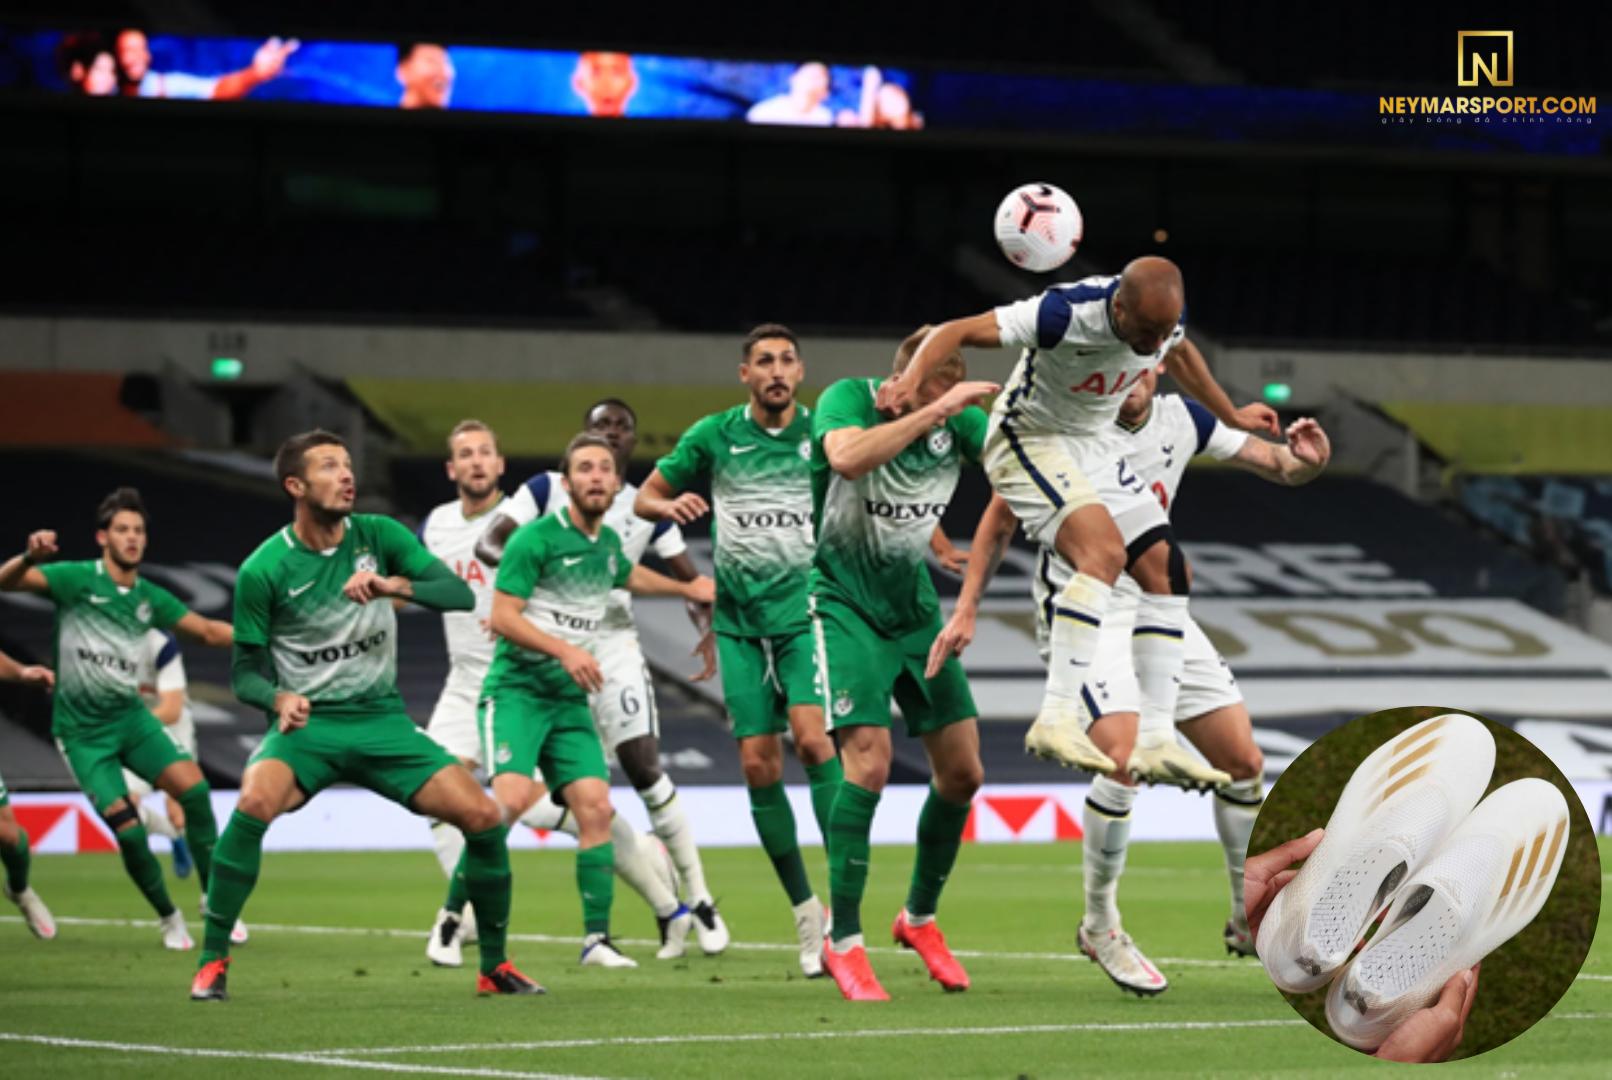 Lucas Moura mang giày đá banh Adidas X Ghosted (Tottenham vs Maccabi Haifa)